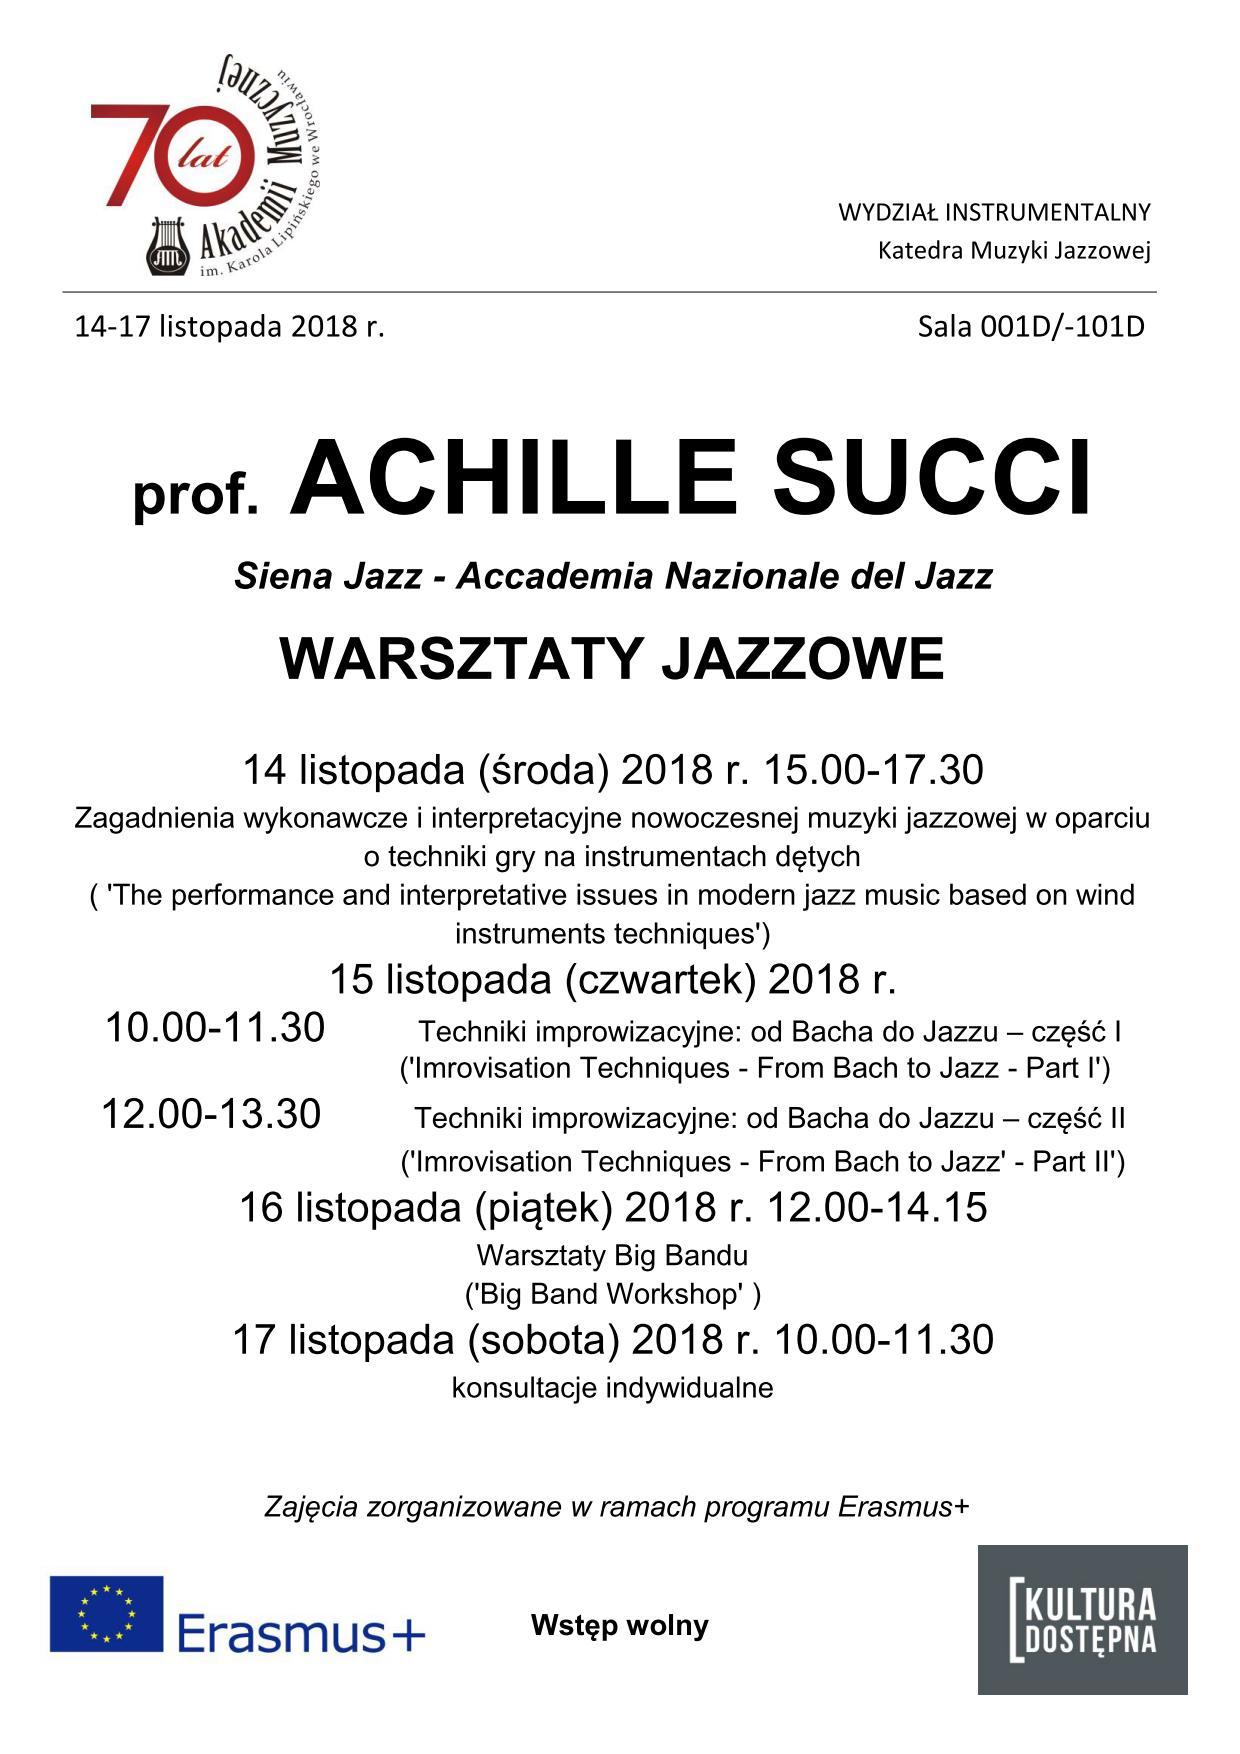 Warsztaty jazzowe - prof. Achille Succi